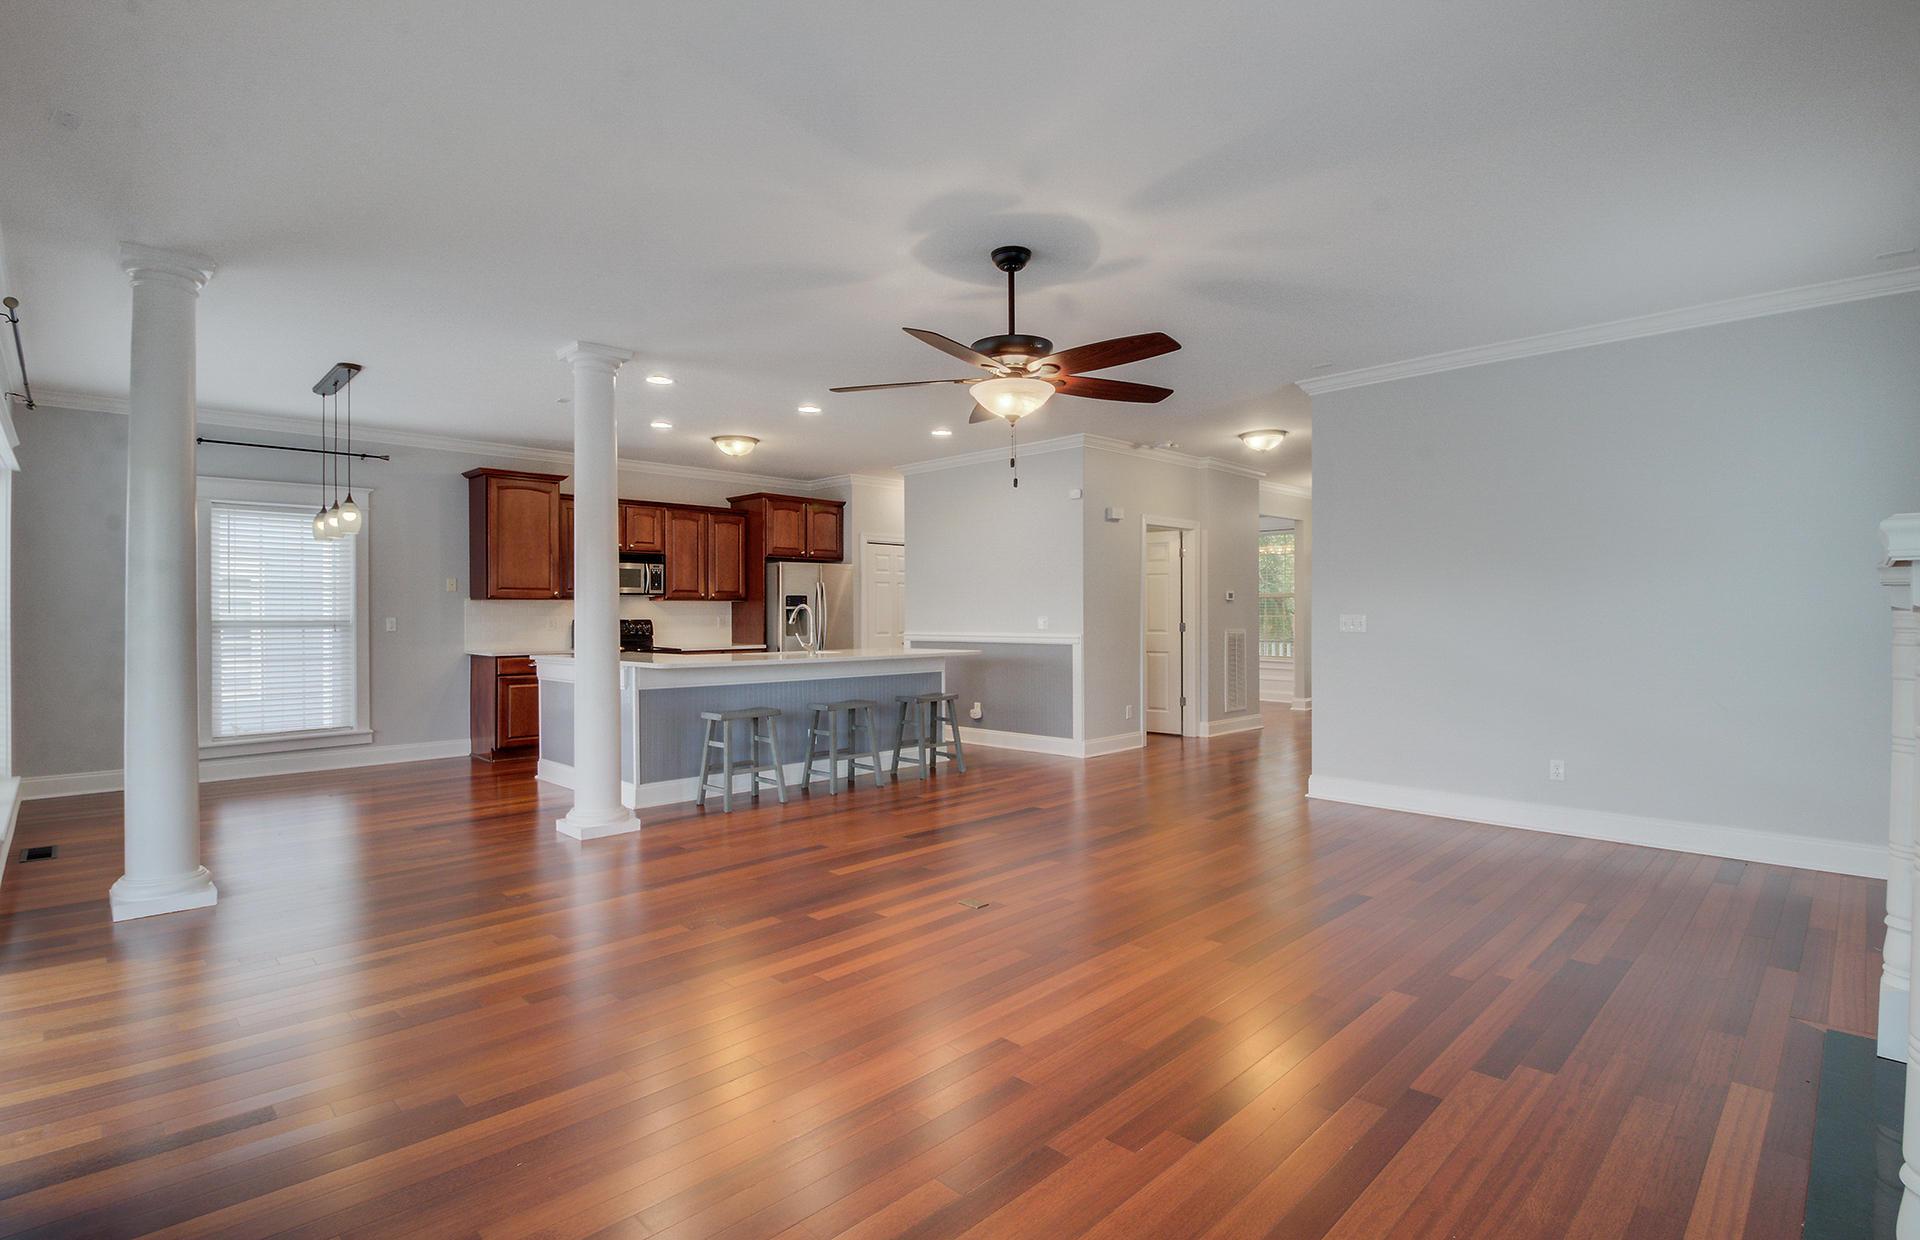 Daniel Island Homes For Sale - 306 Ladd, Charleston, SC - 10